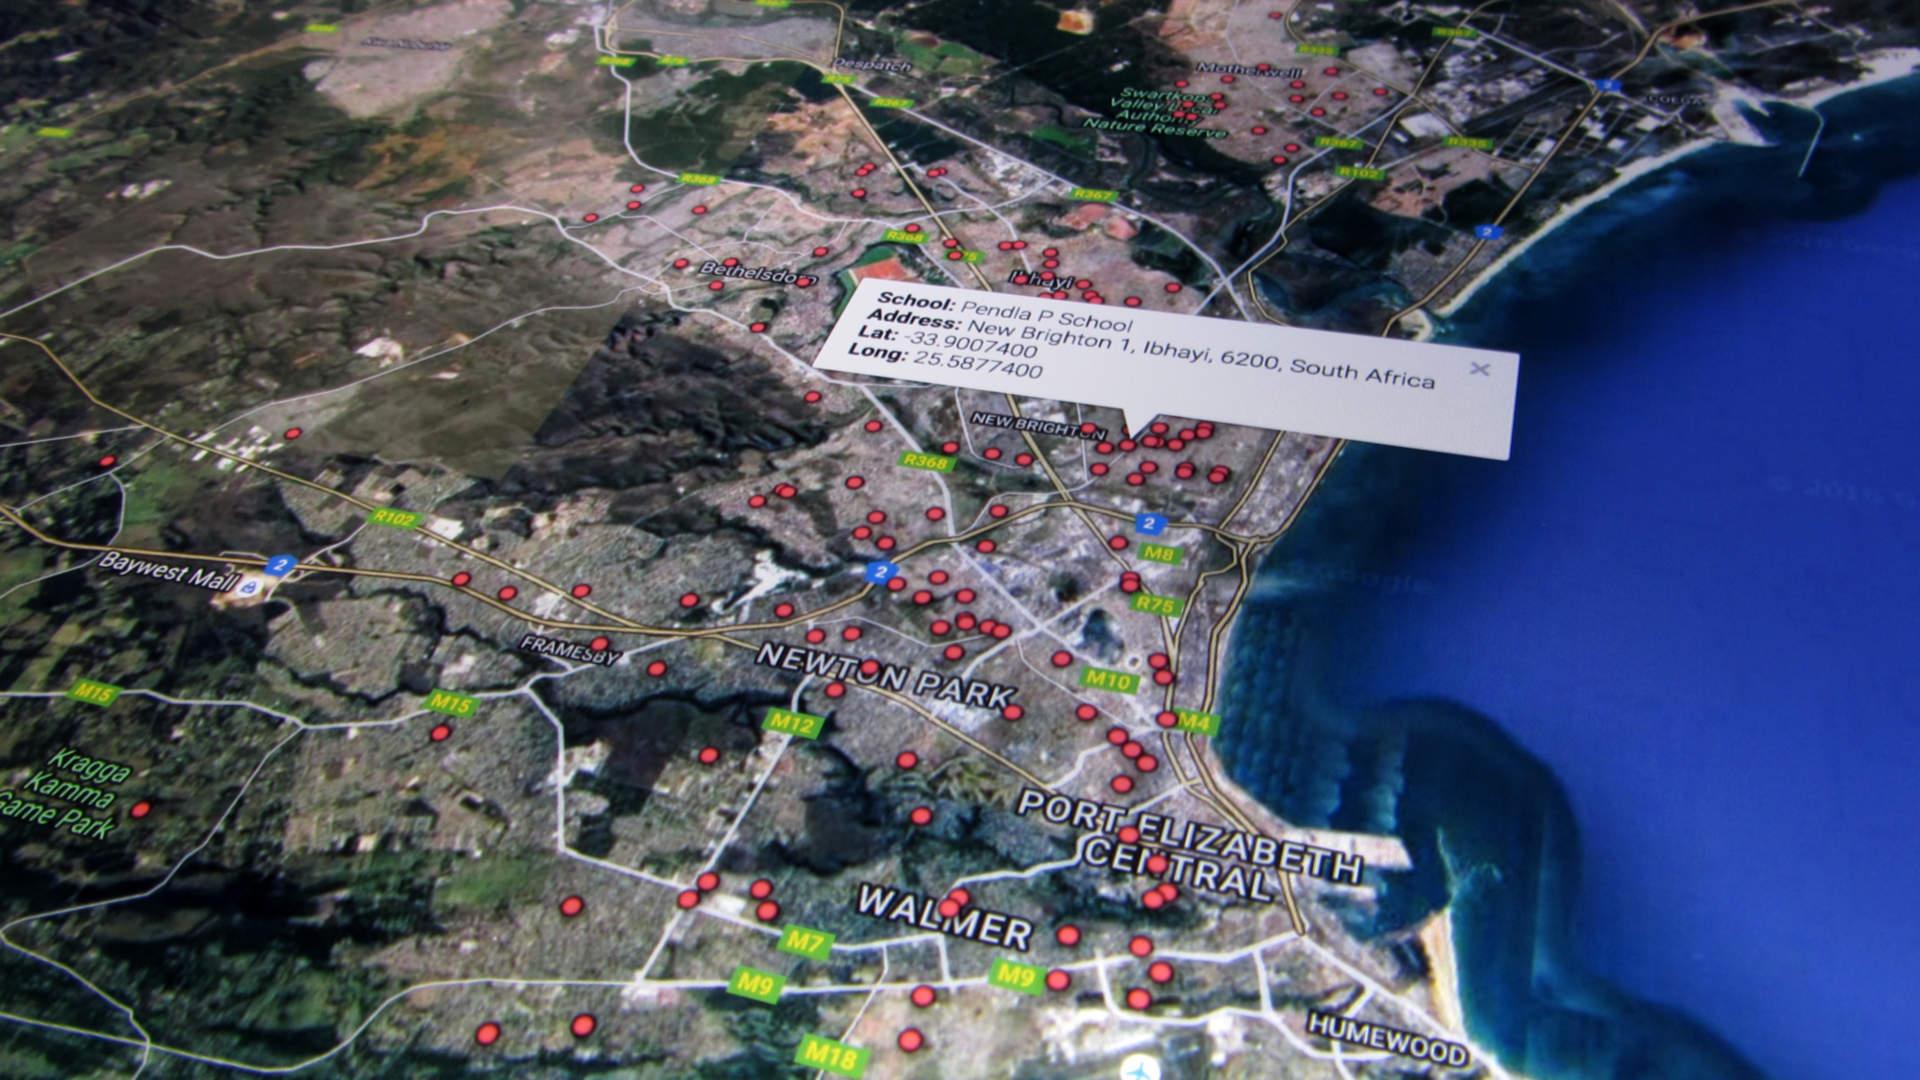 Schools Port Elizabeth onto Google Maps